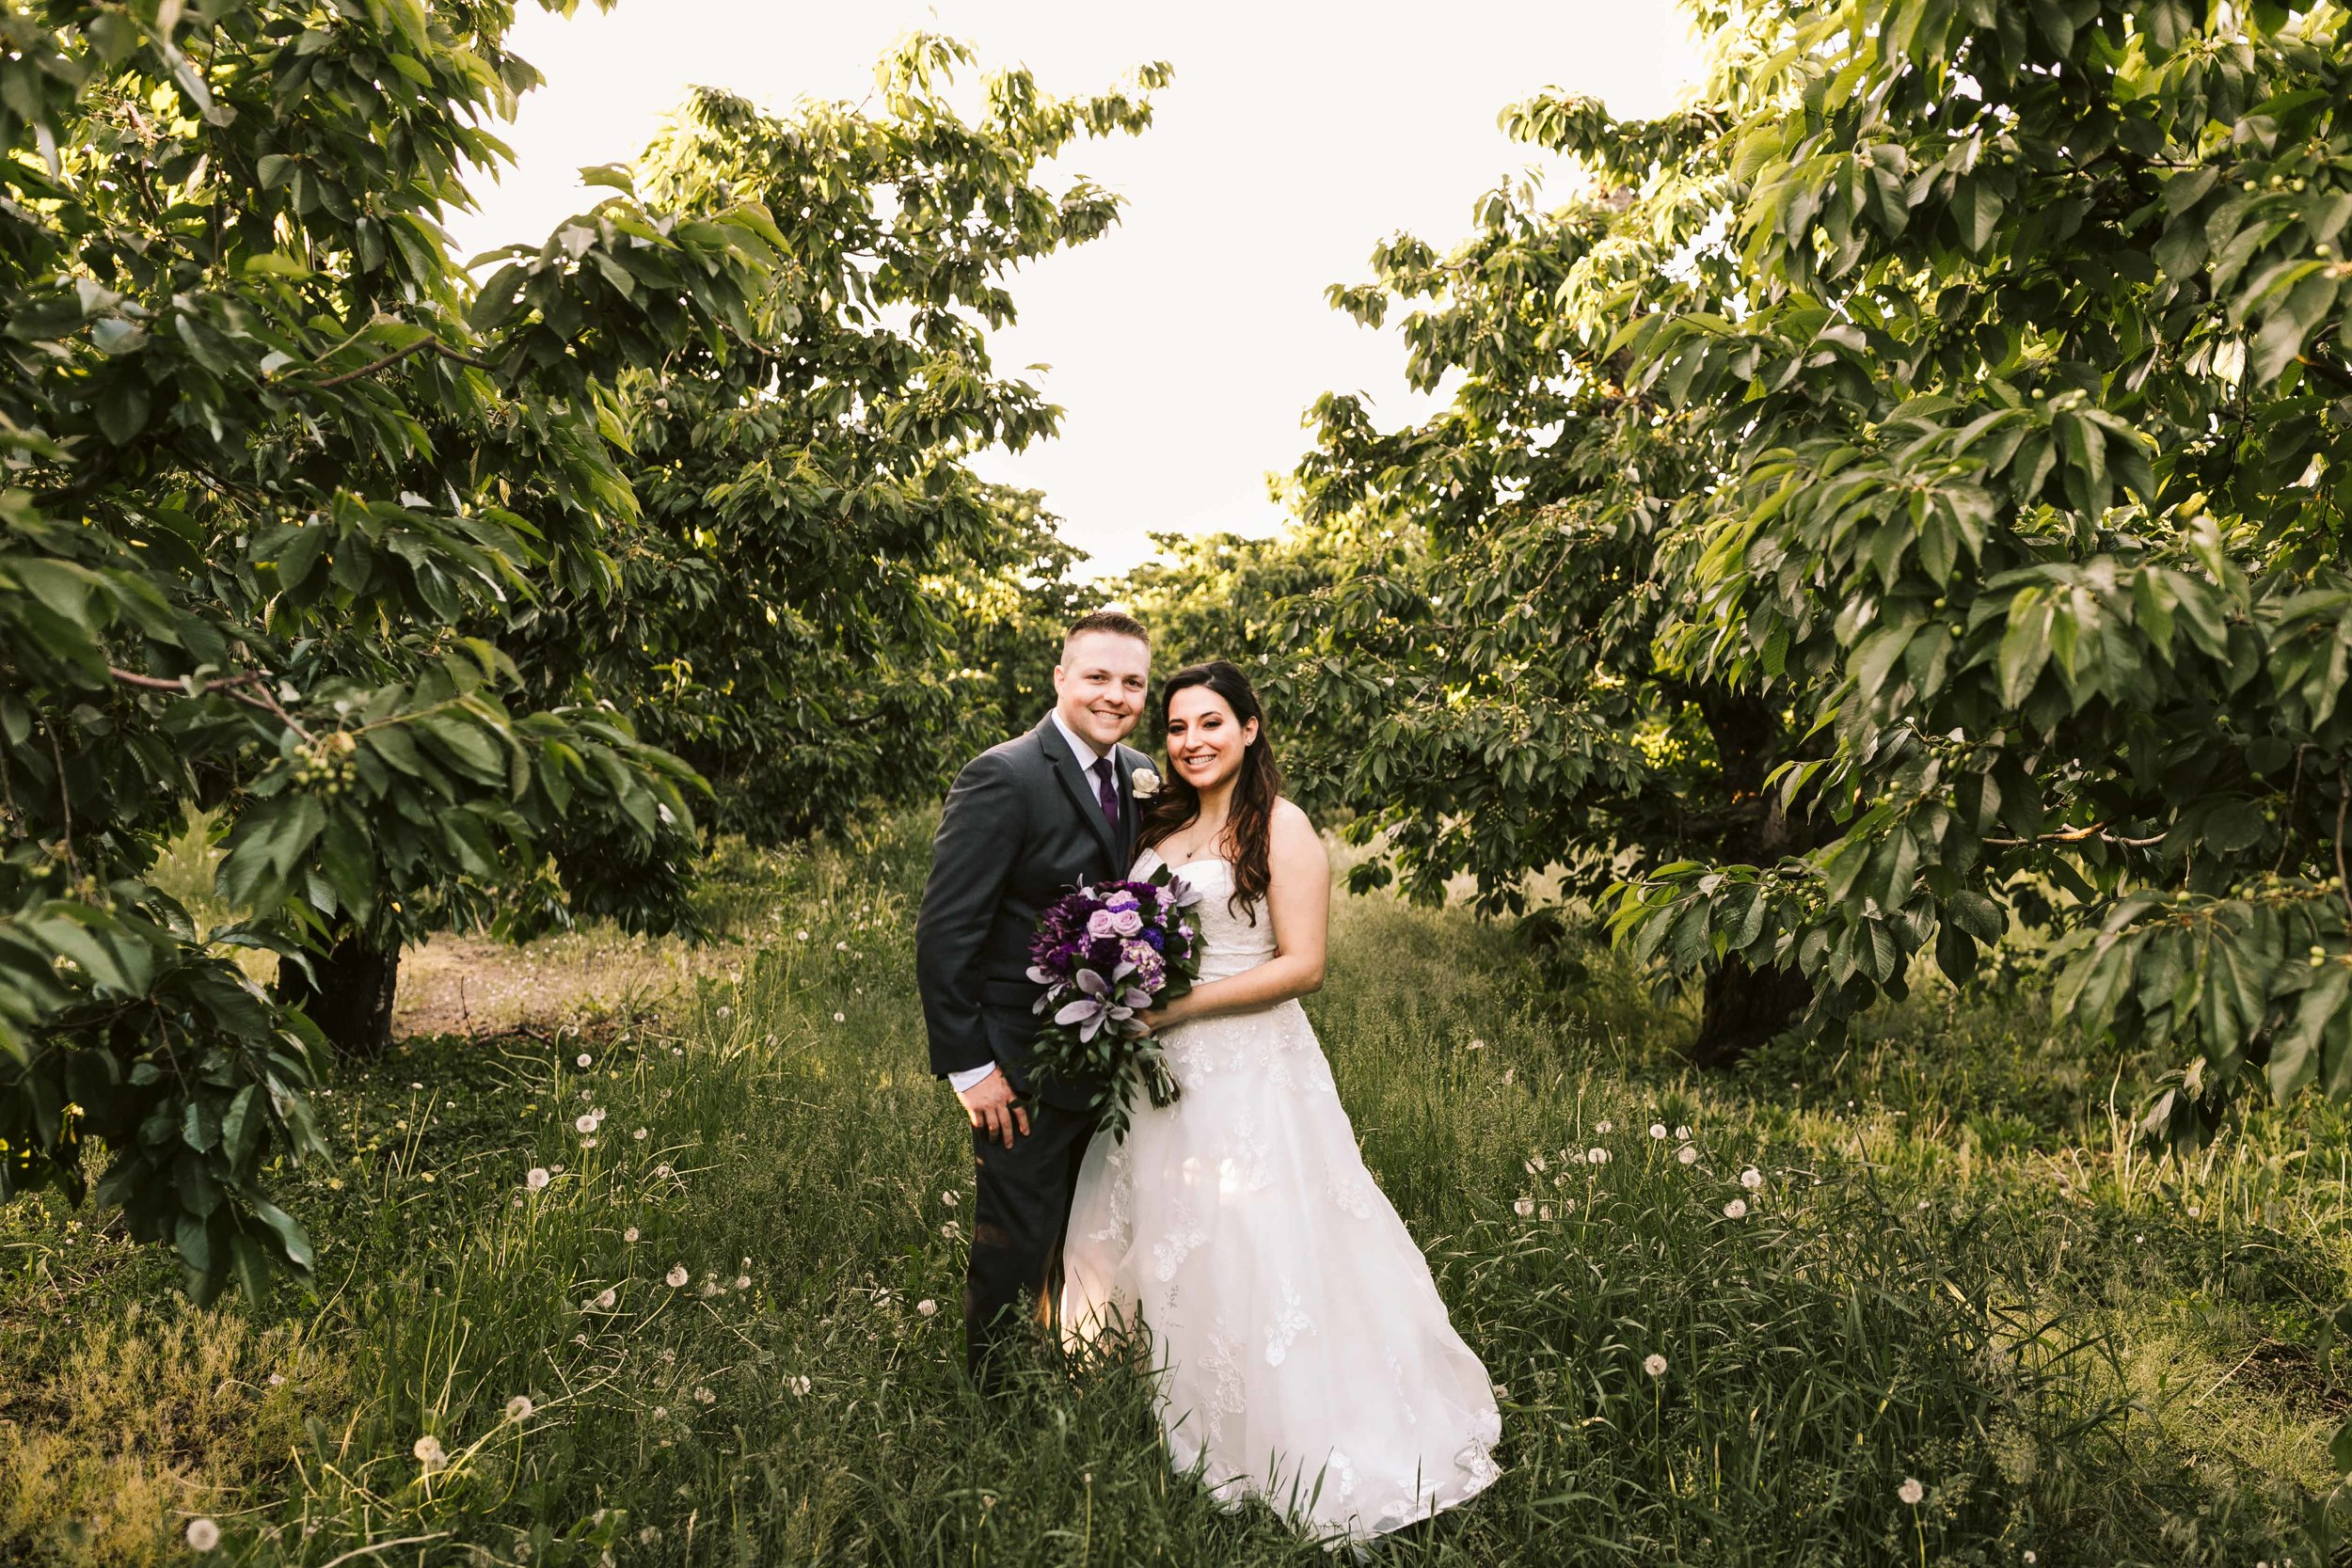 tuncannon-cellars-wedding-115.jpg